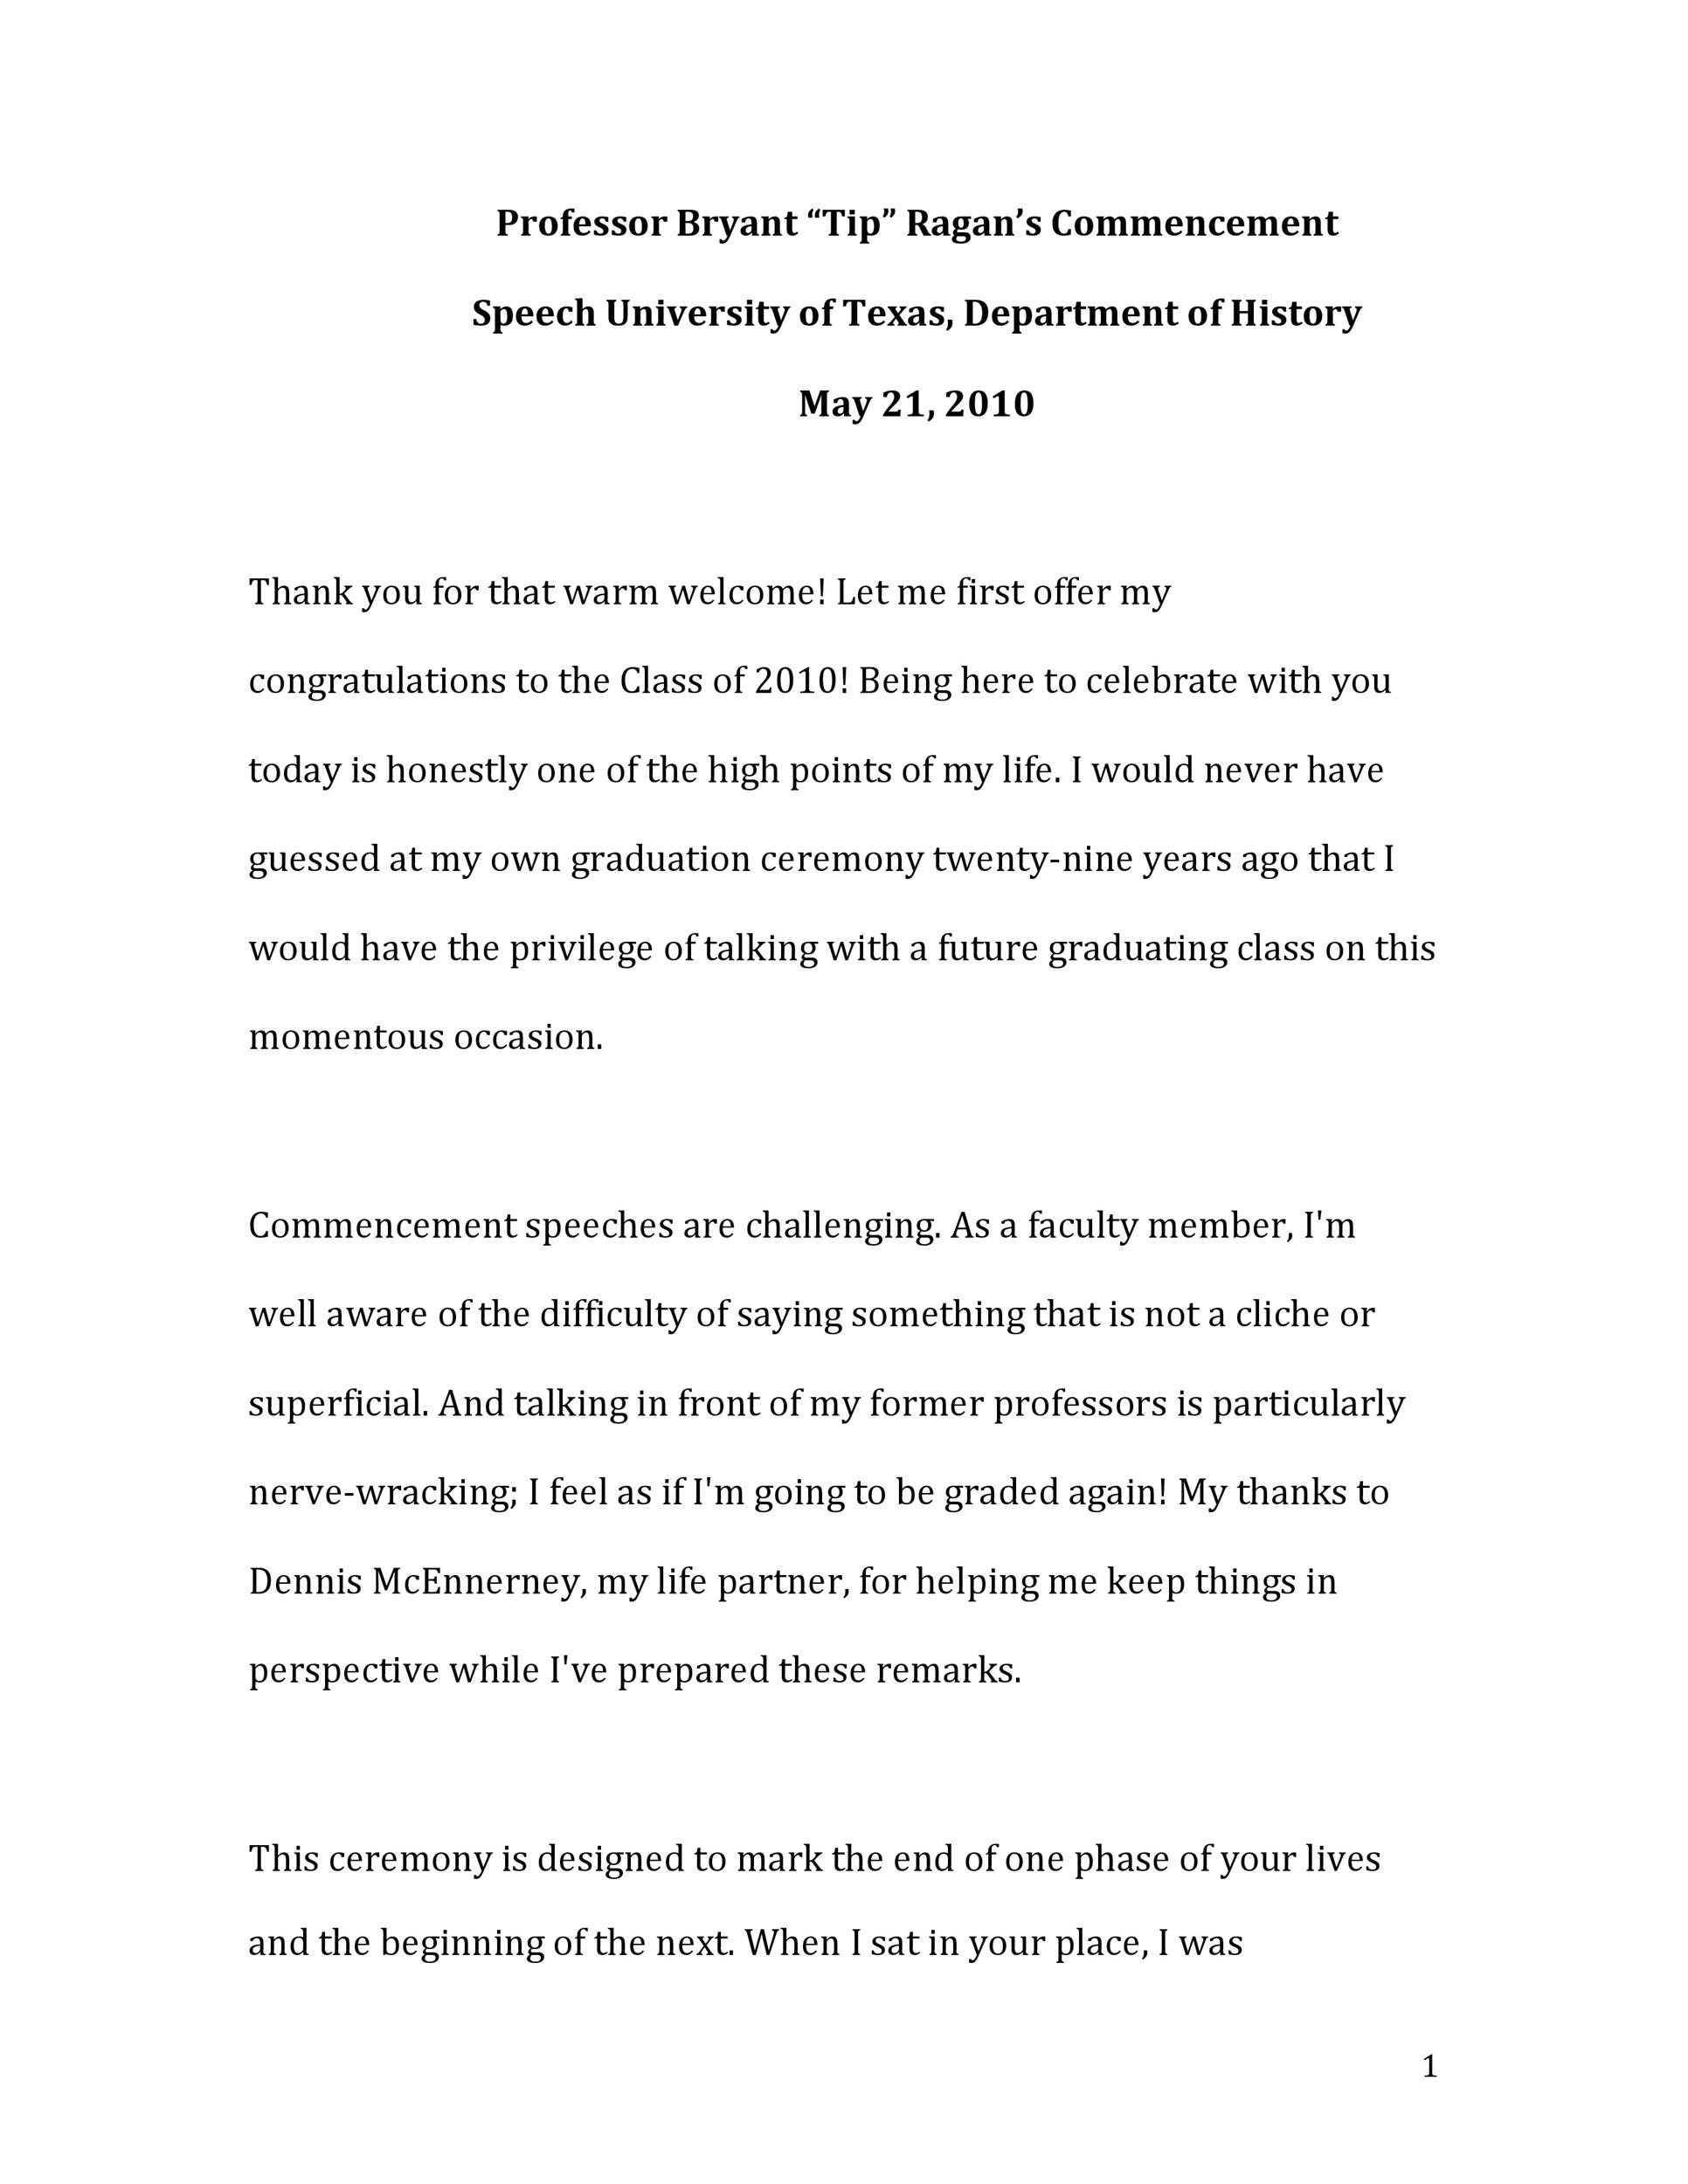 Free graduation speech example 07